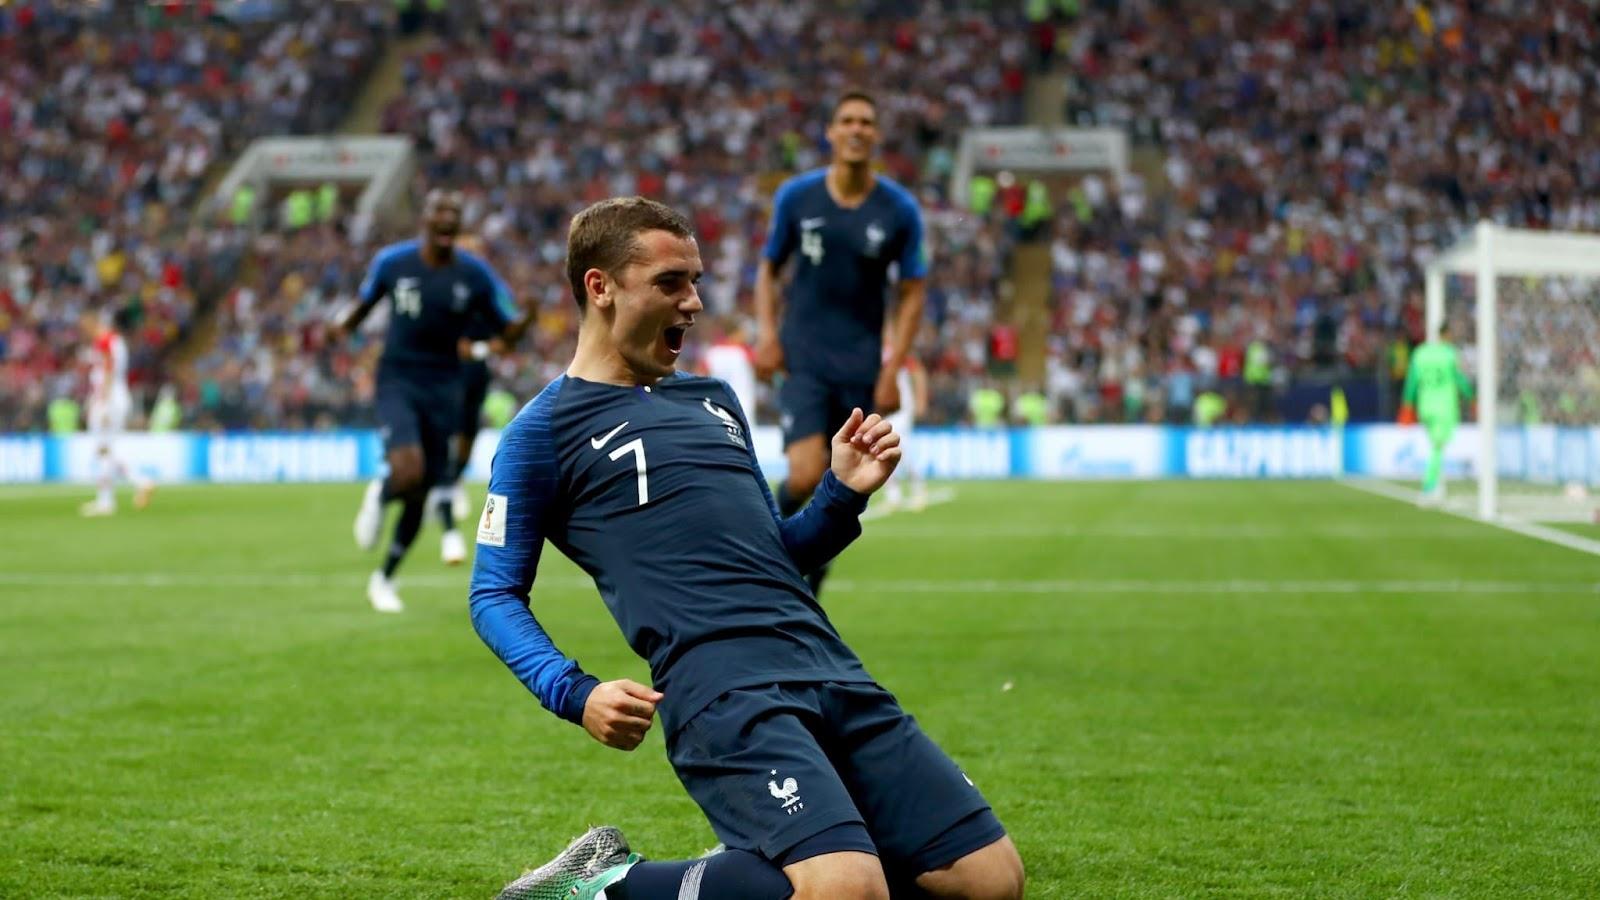 C:\Users\Carla\Desktop\Copa do Mundo 2018 - RUSSIA\França\Final\Galeria da campea\Griezmann comemora seu gol.jpg